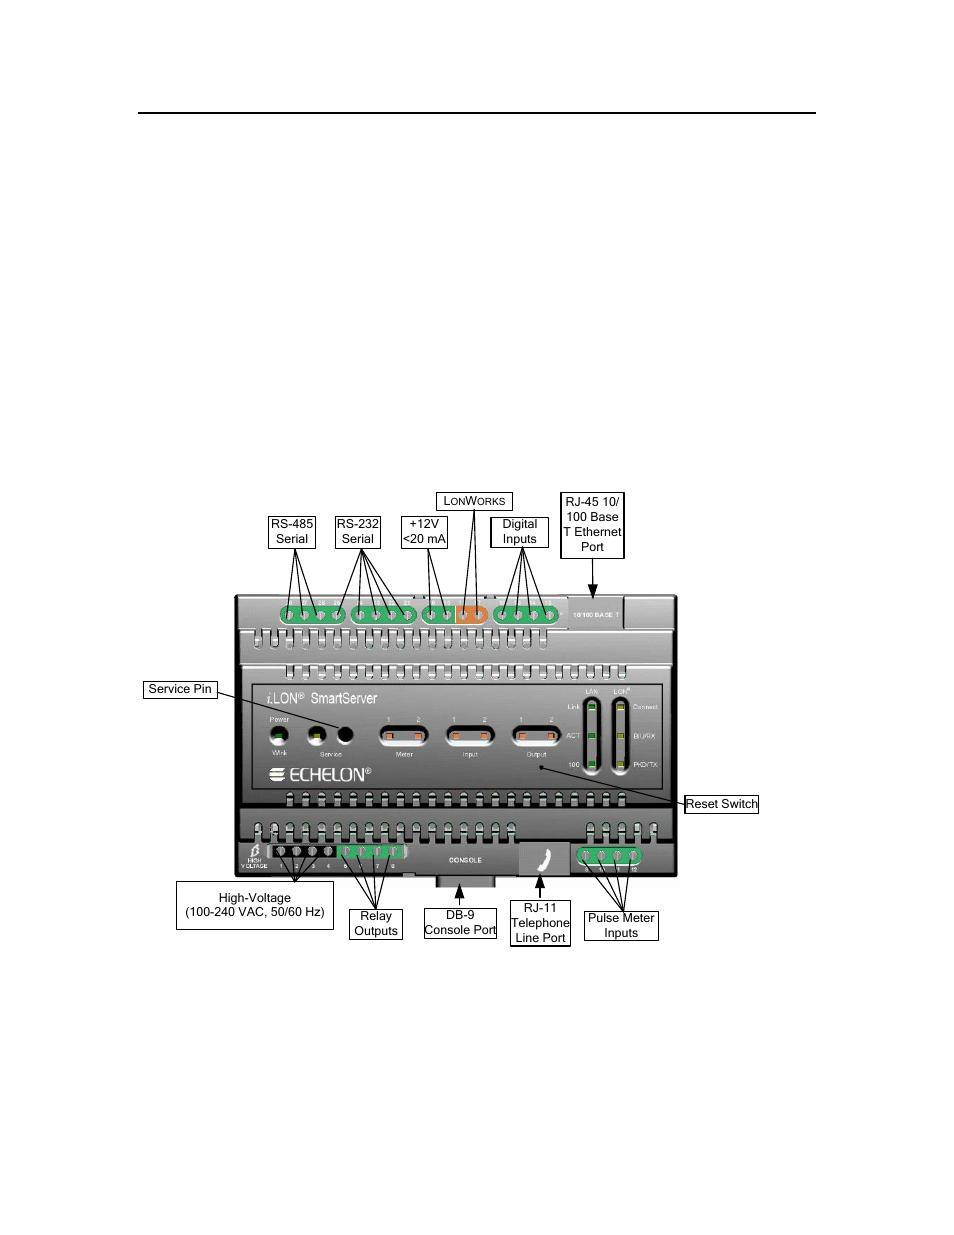 Wiring the smartserver connections | Echelon SmartServer 2.2 ...